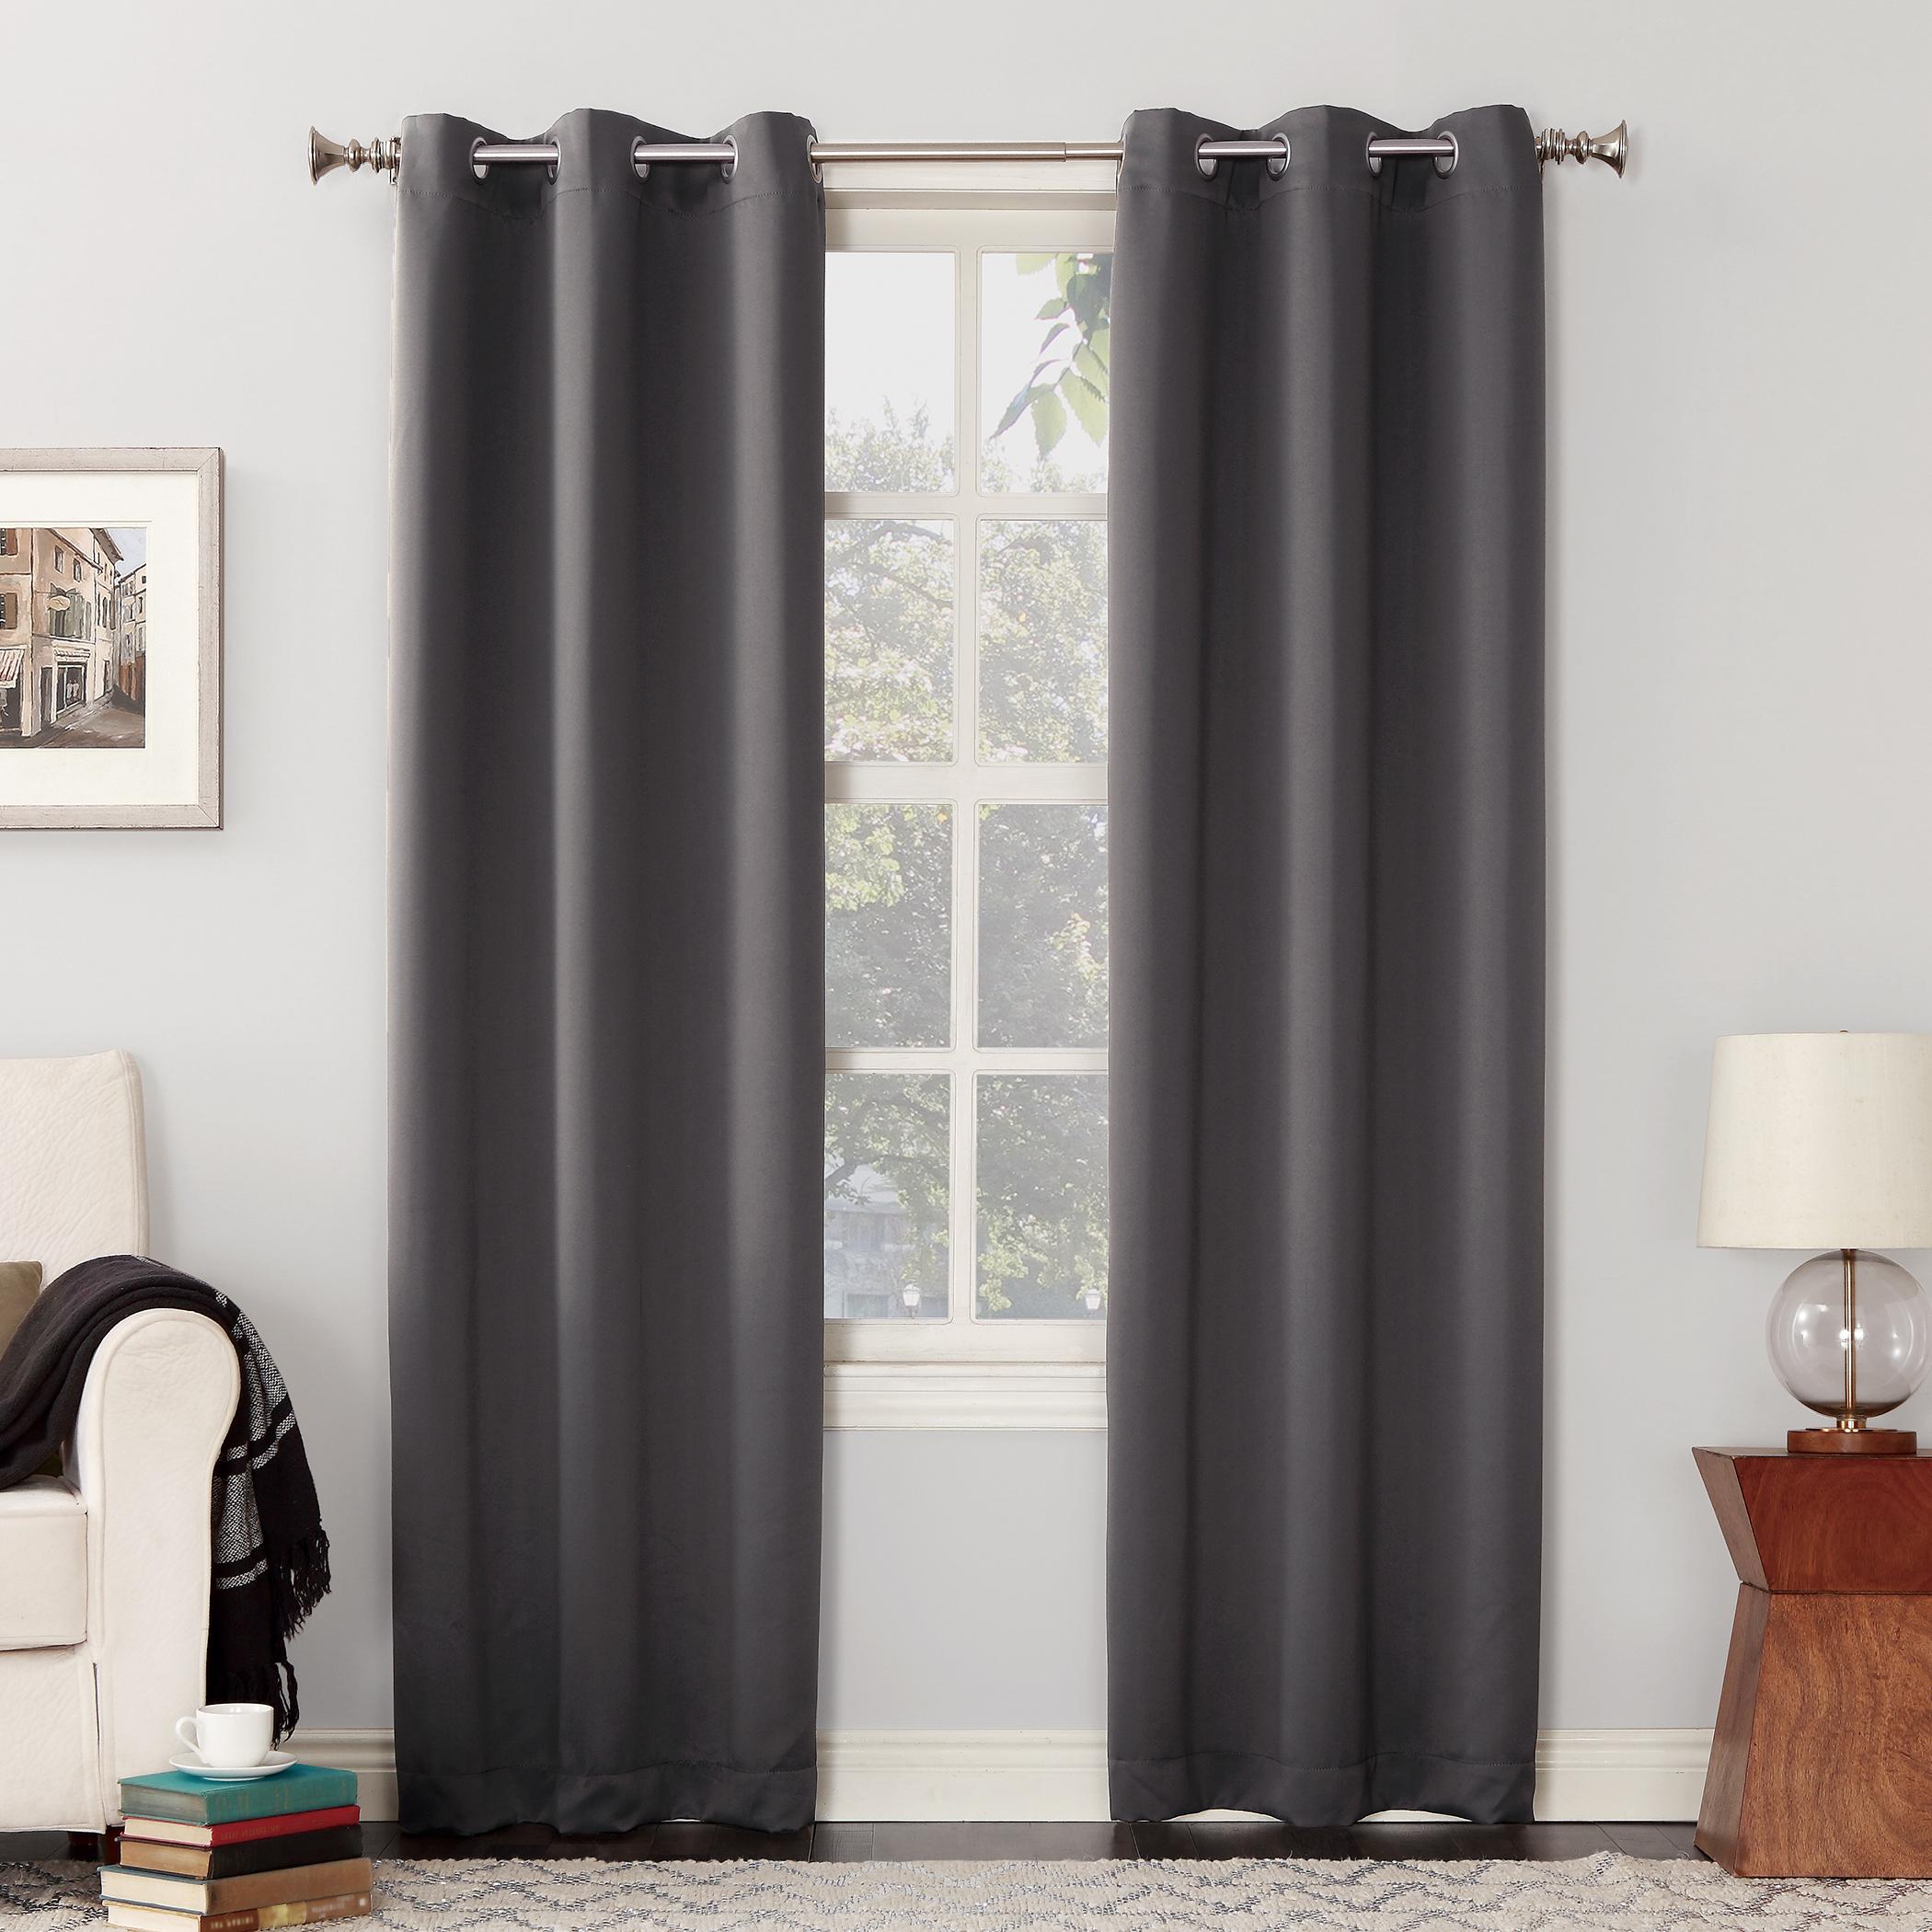 Warm Black Velvet Single Blackout Curtain Panels For Most Recent Sun Zero Nolan Energy Efficient Blackout Grommet Curtain Panel (View 19 of 20)